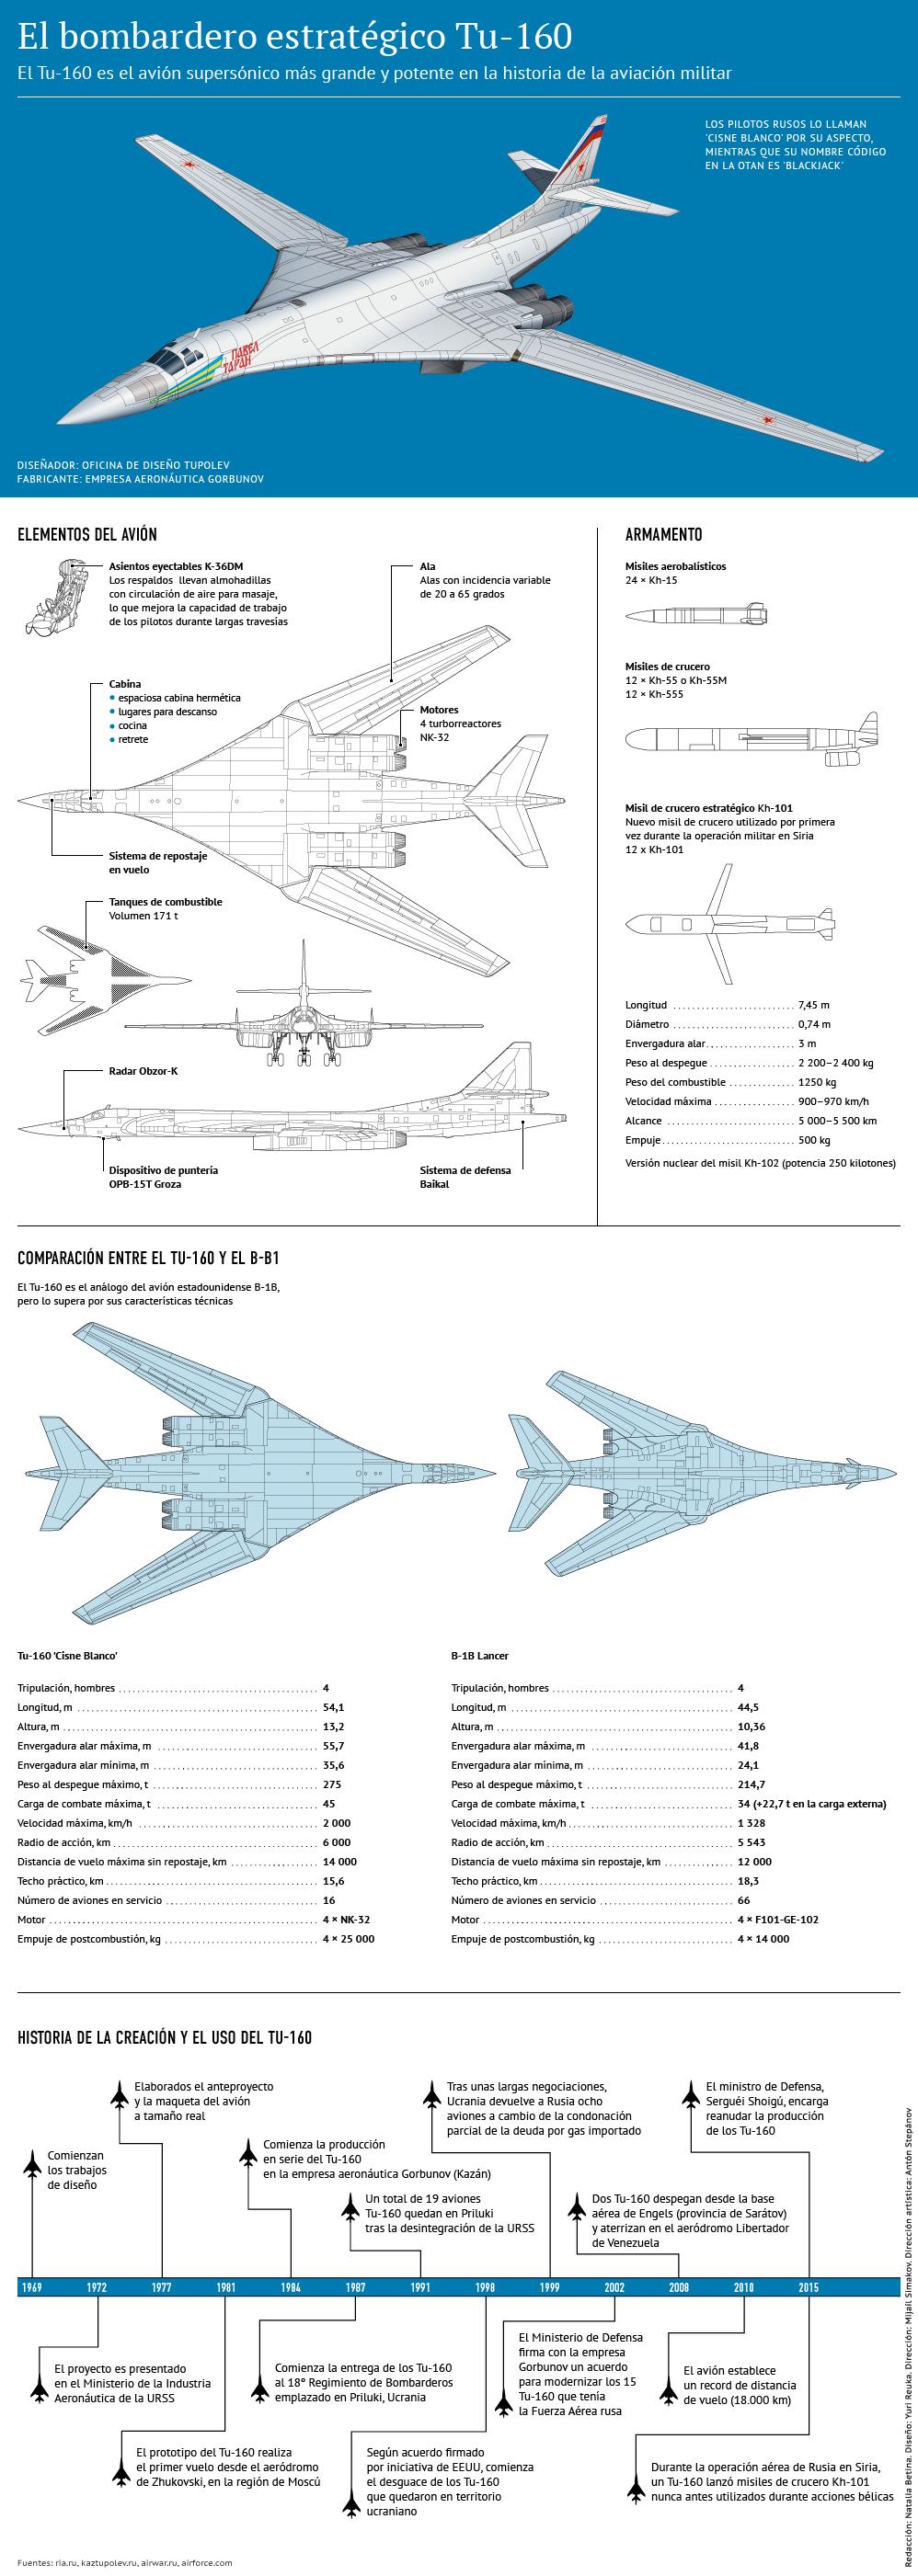 El bombardero estratégico Tu-160